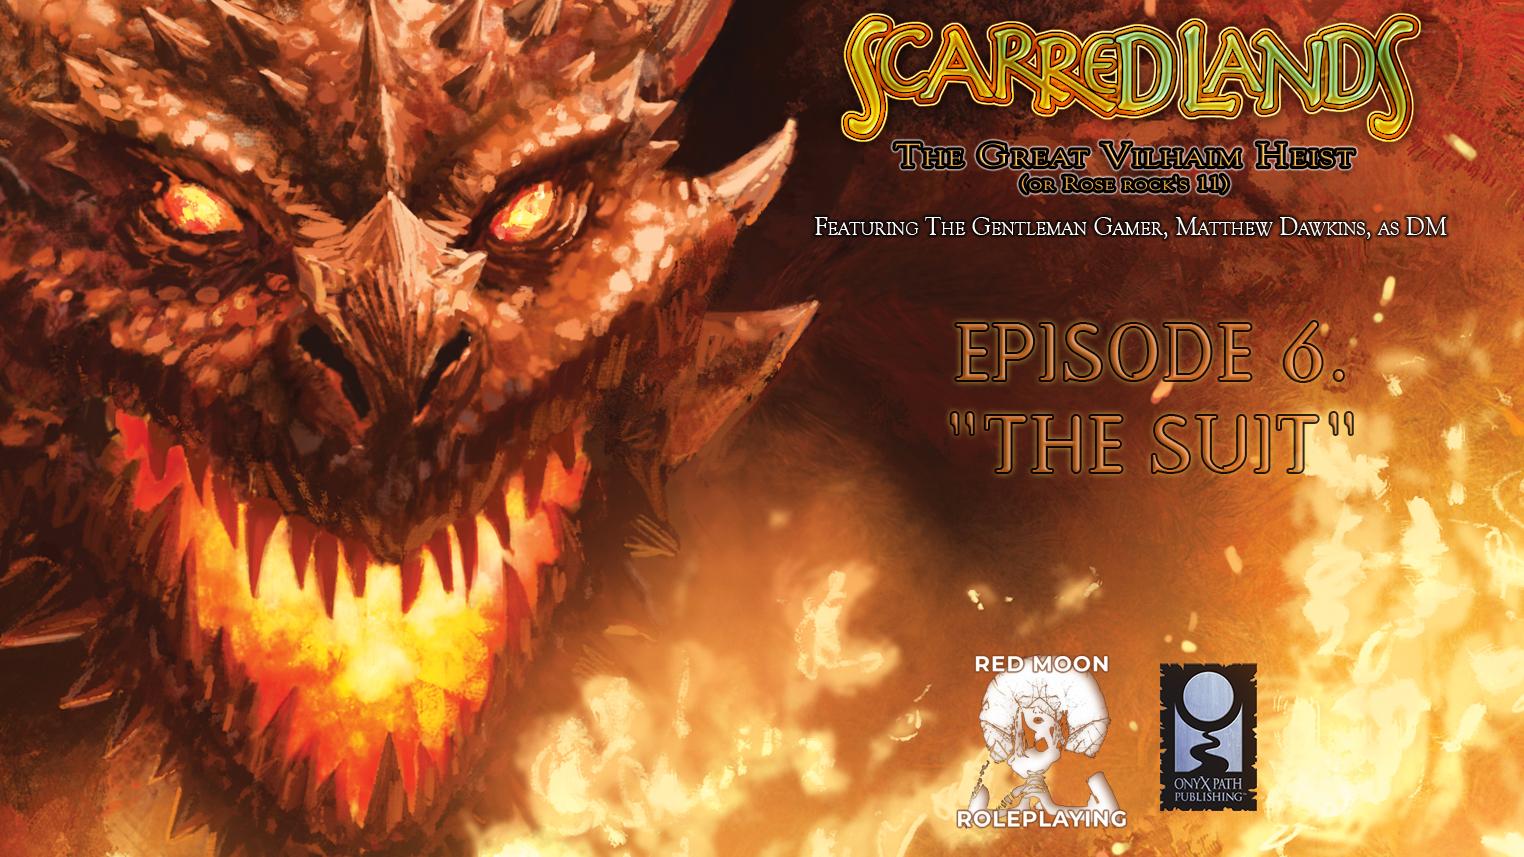 SCARRED_06.jpg